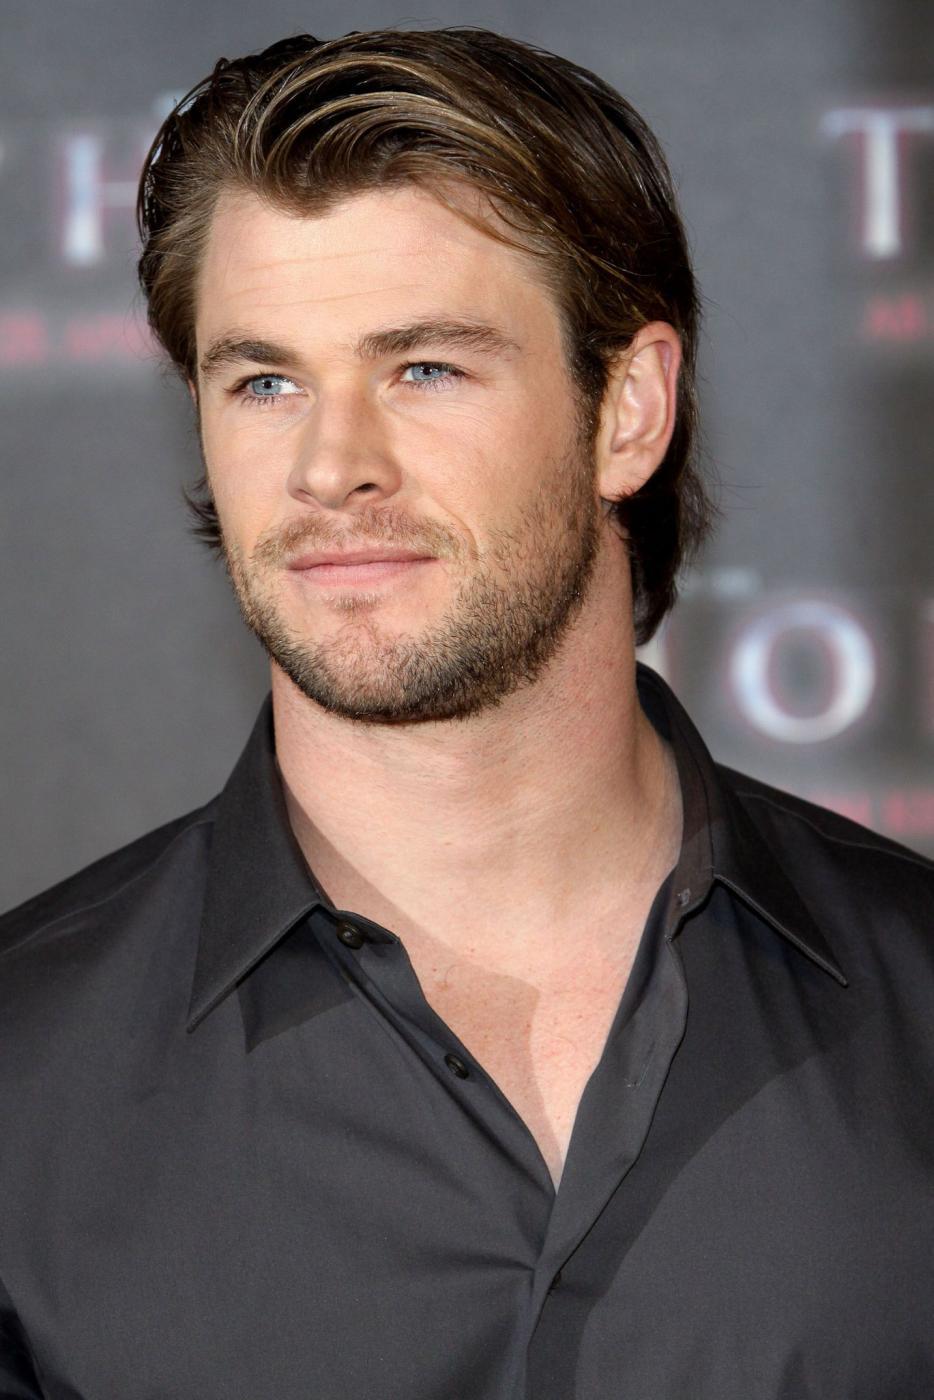 Chris Hemsworth Long Hair Styles Men Medium Length Hair Men Mens Hairstyles Medium